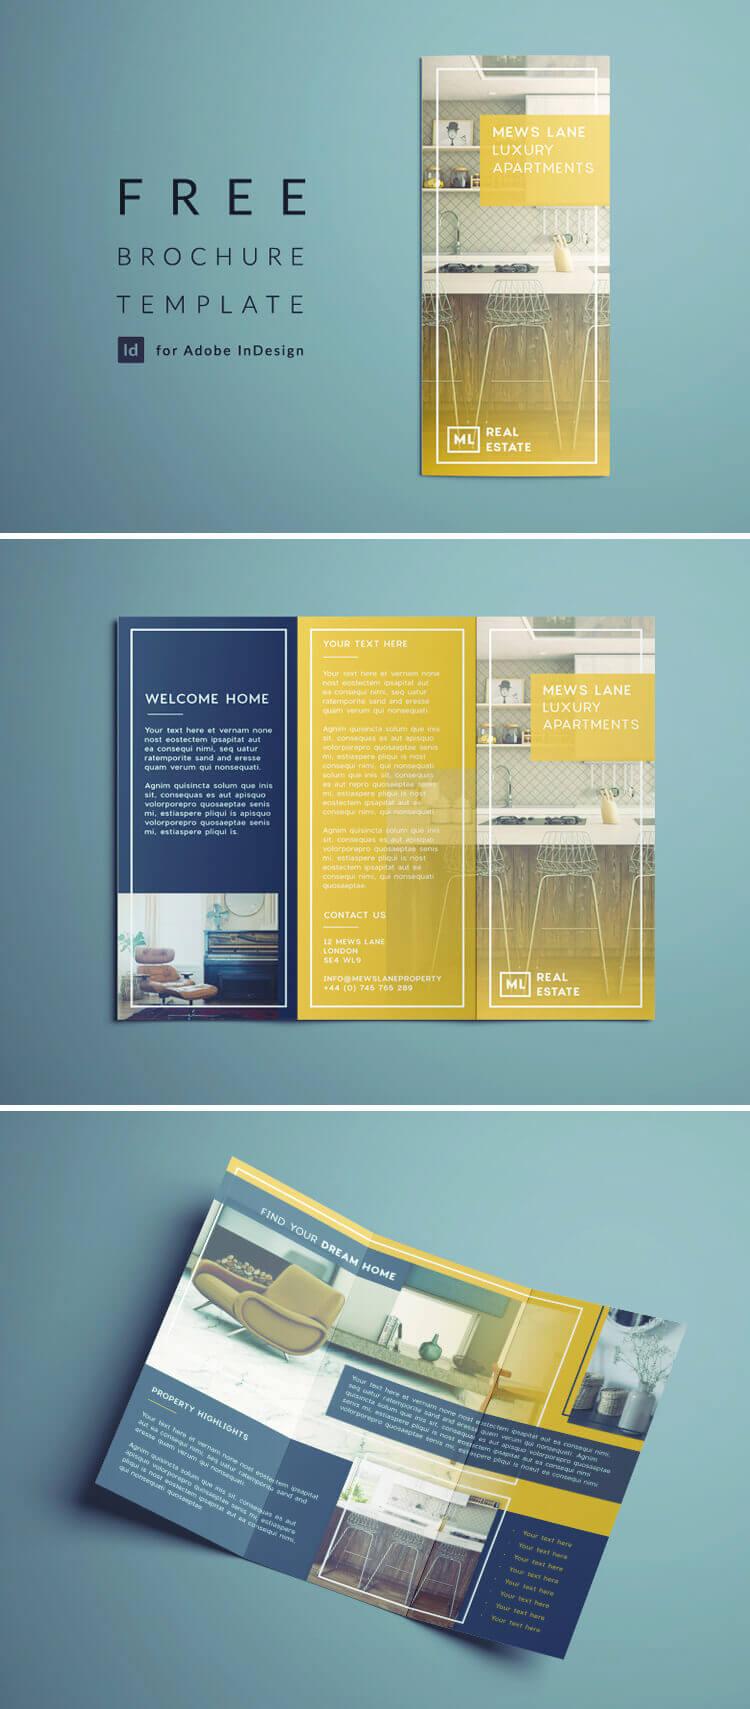 Tri Fold Brochure | Free Indesign Template Pertaining To Indesign Templates Free Download Brochure